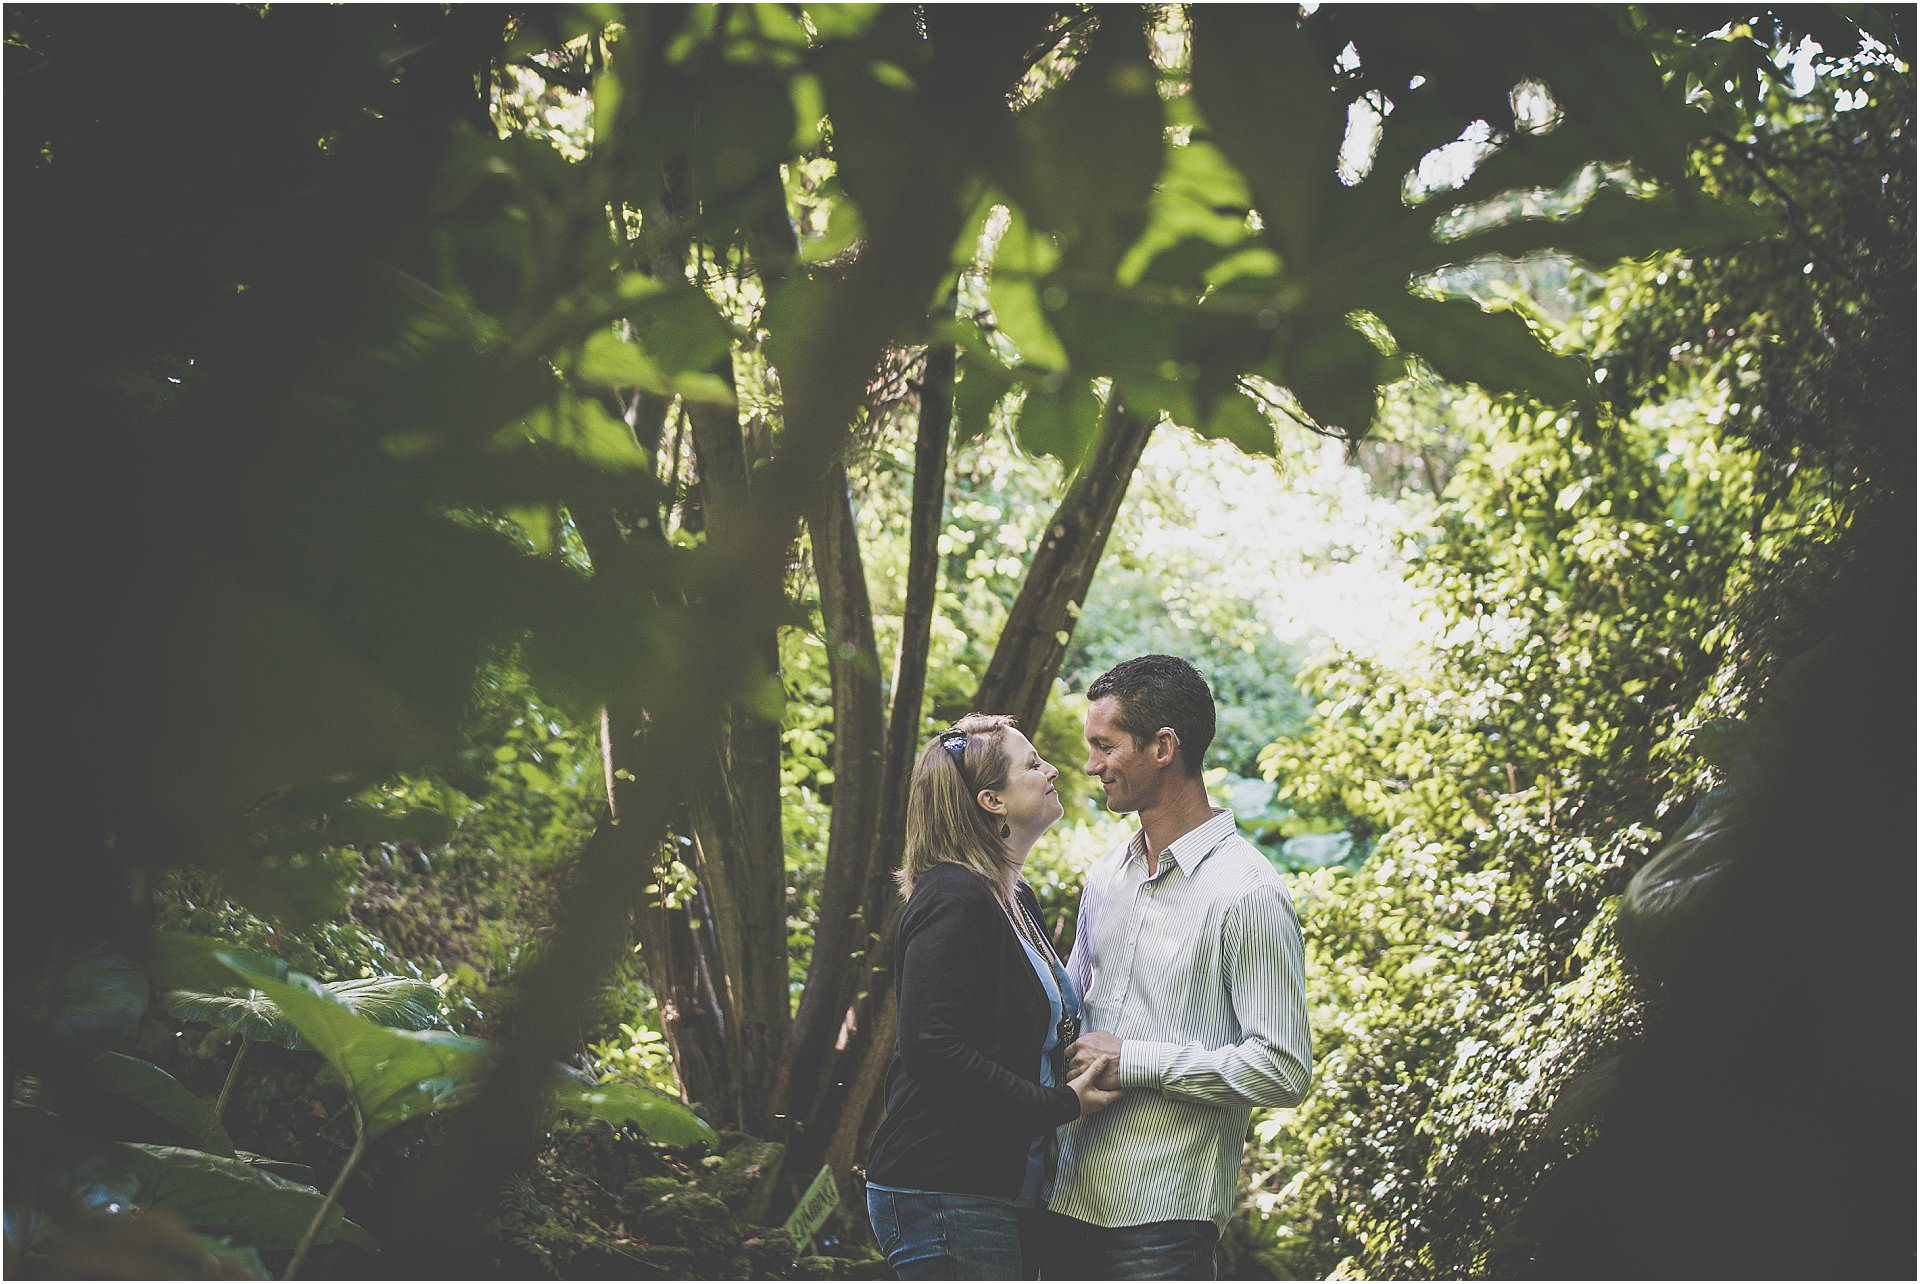 engagment photography pre-wedding shoots wedding photographer